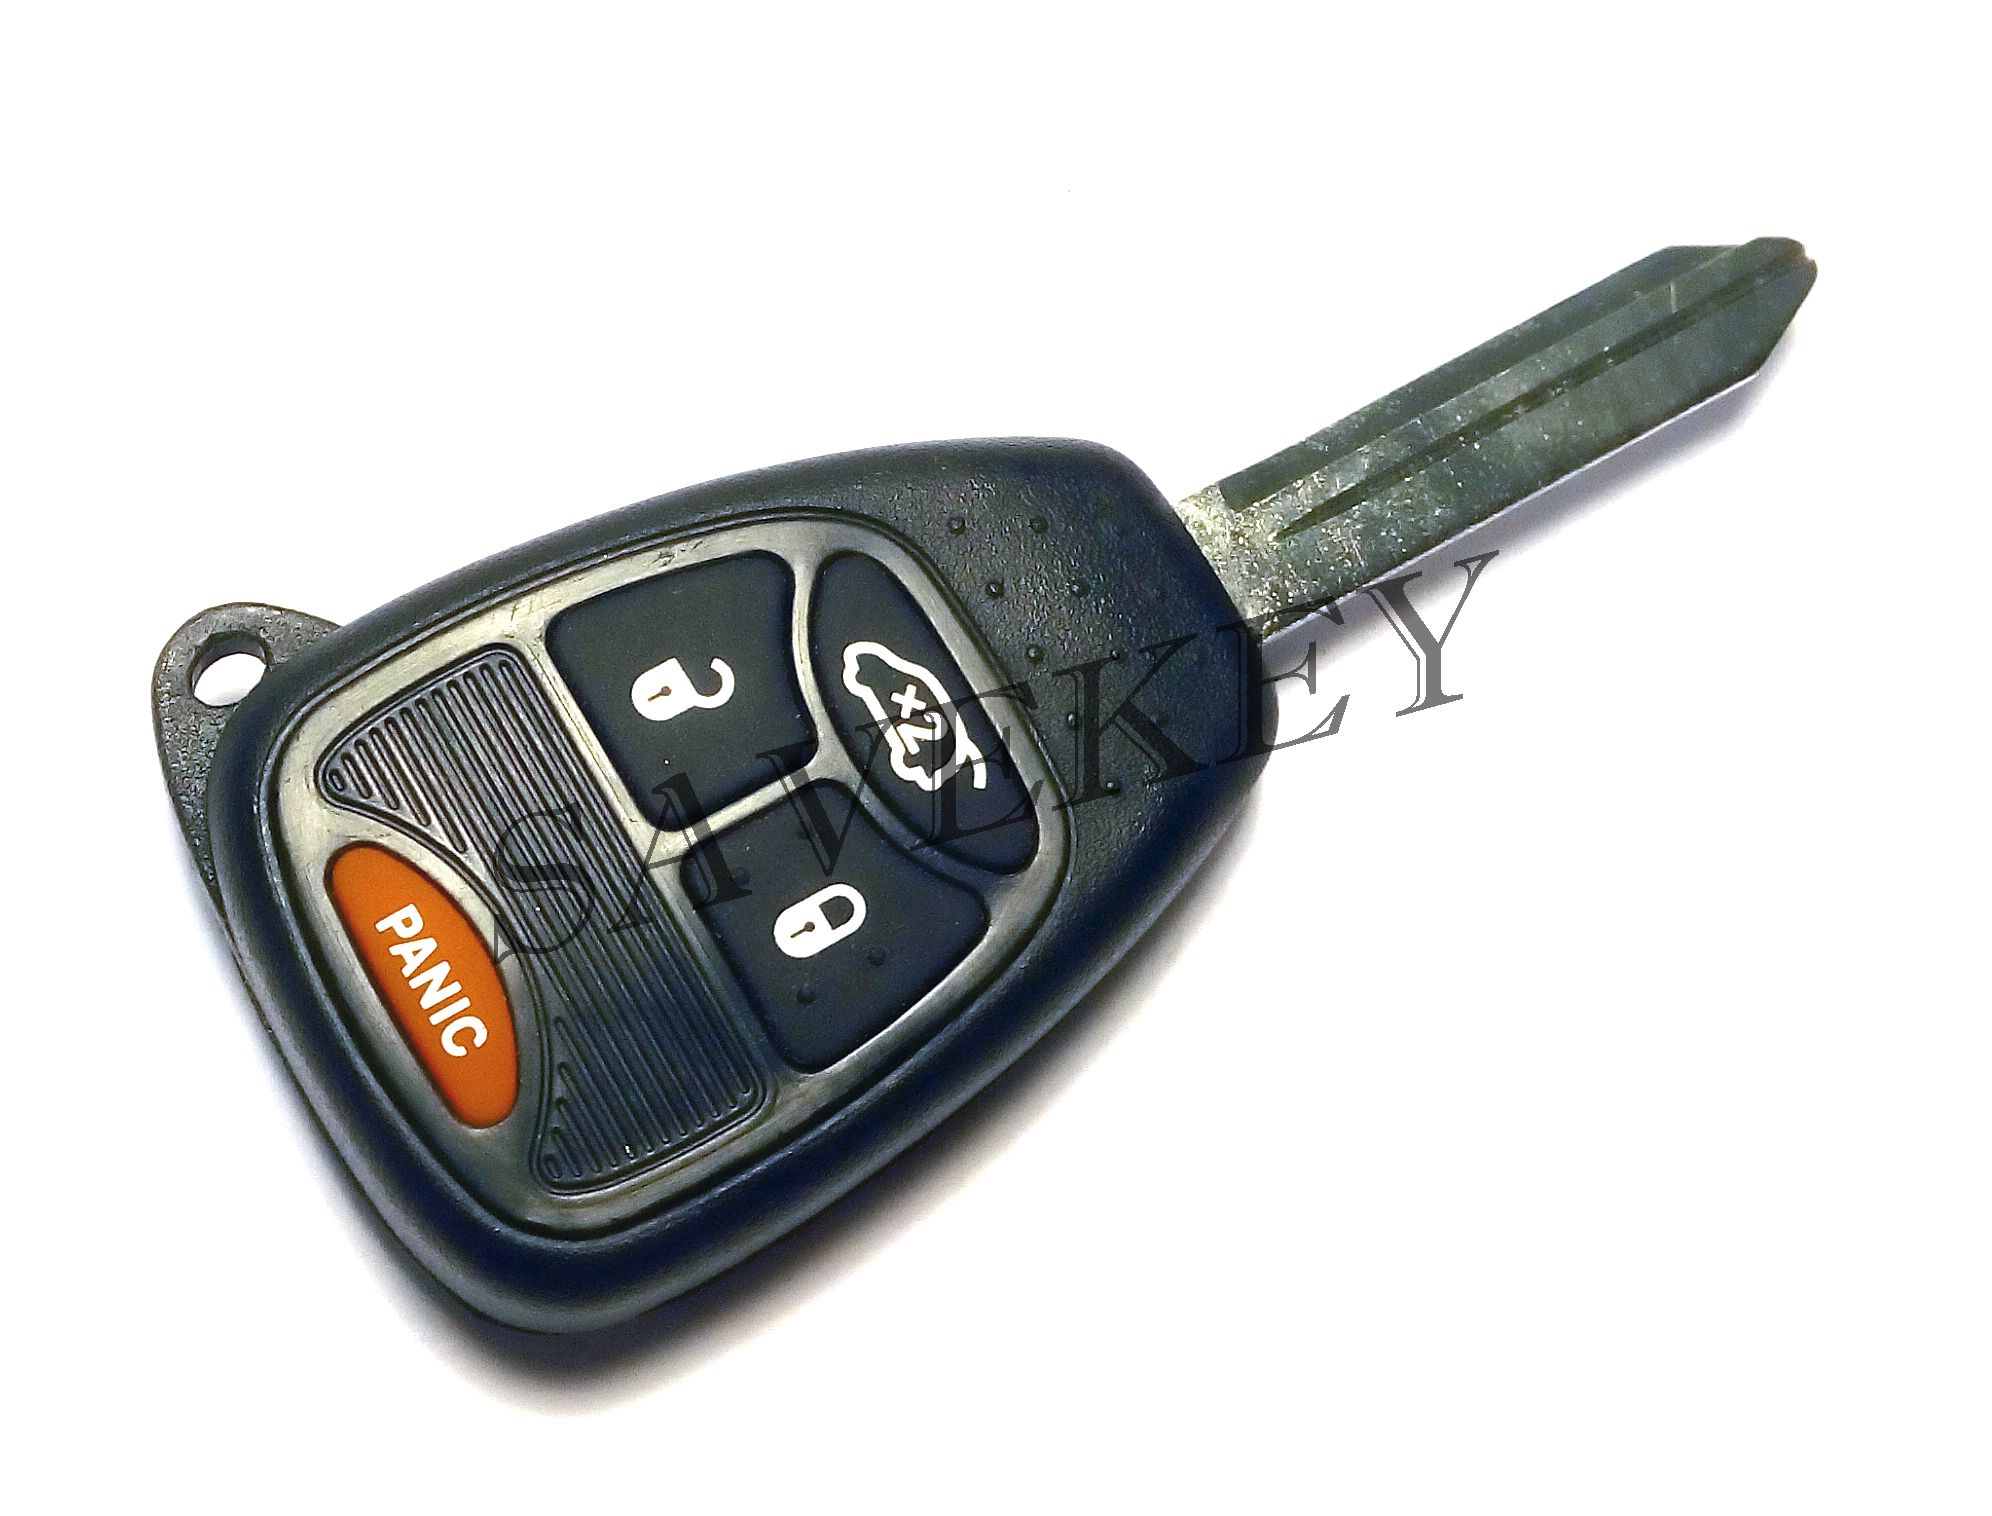 Дистанционный ключ Jeep для моделейPACIFICA, LIBERTY, COMPASS, CHEROKEE, LIBERTY, WRANGLER 4 кнопки 433 Mhz